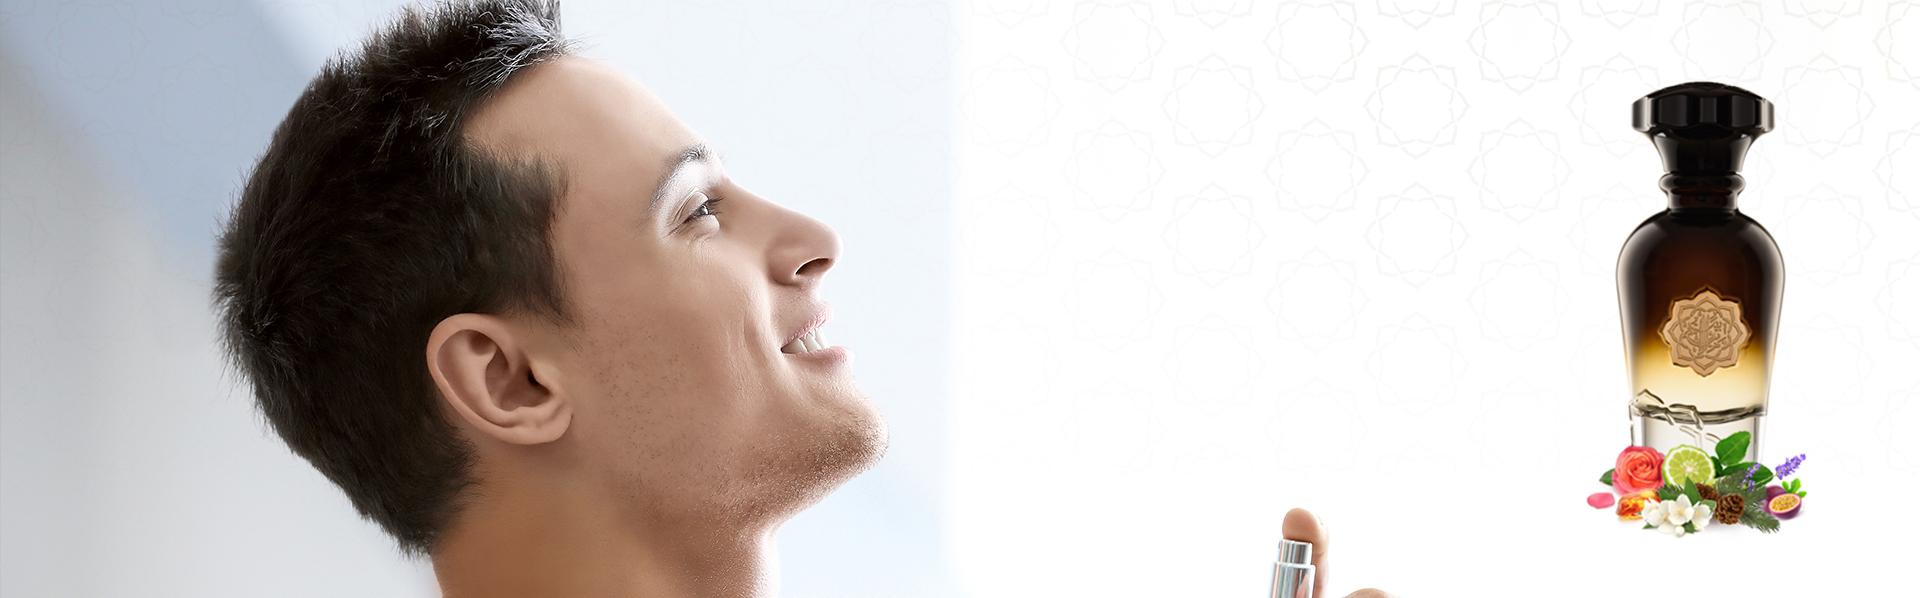 Top-Best-Branded-Perfumes-for-Men-Online-Dubai-UAE